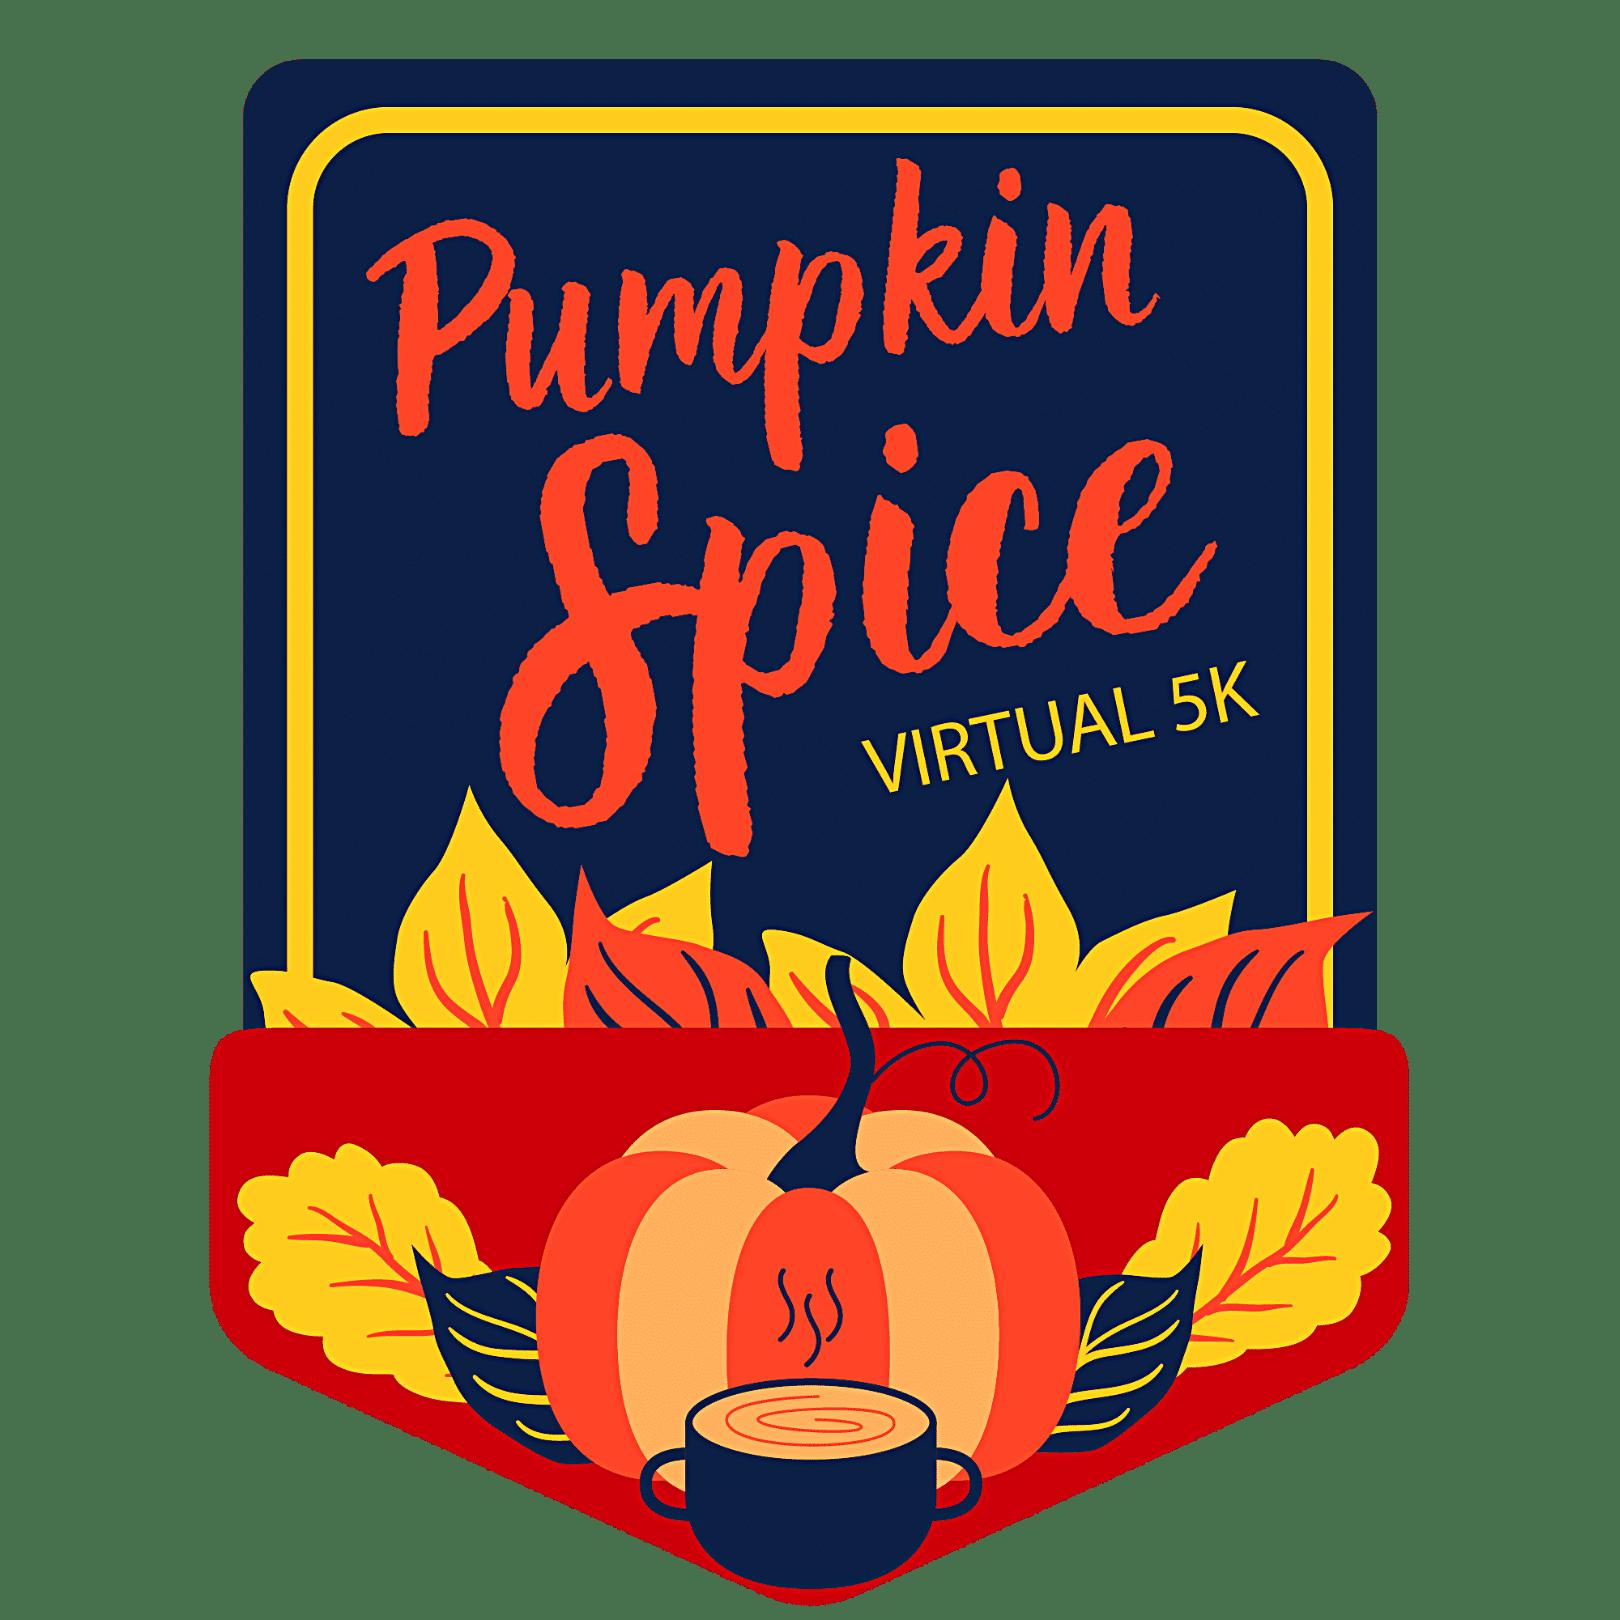 Pumpkin Spice Virtual 5K logo